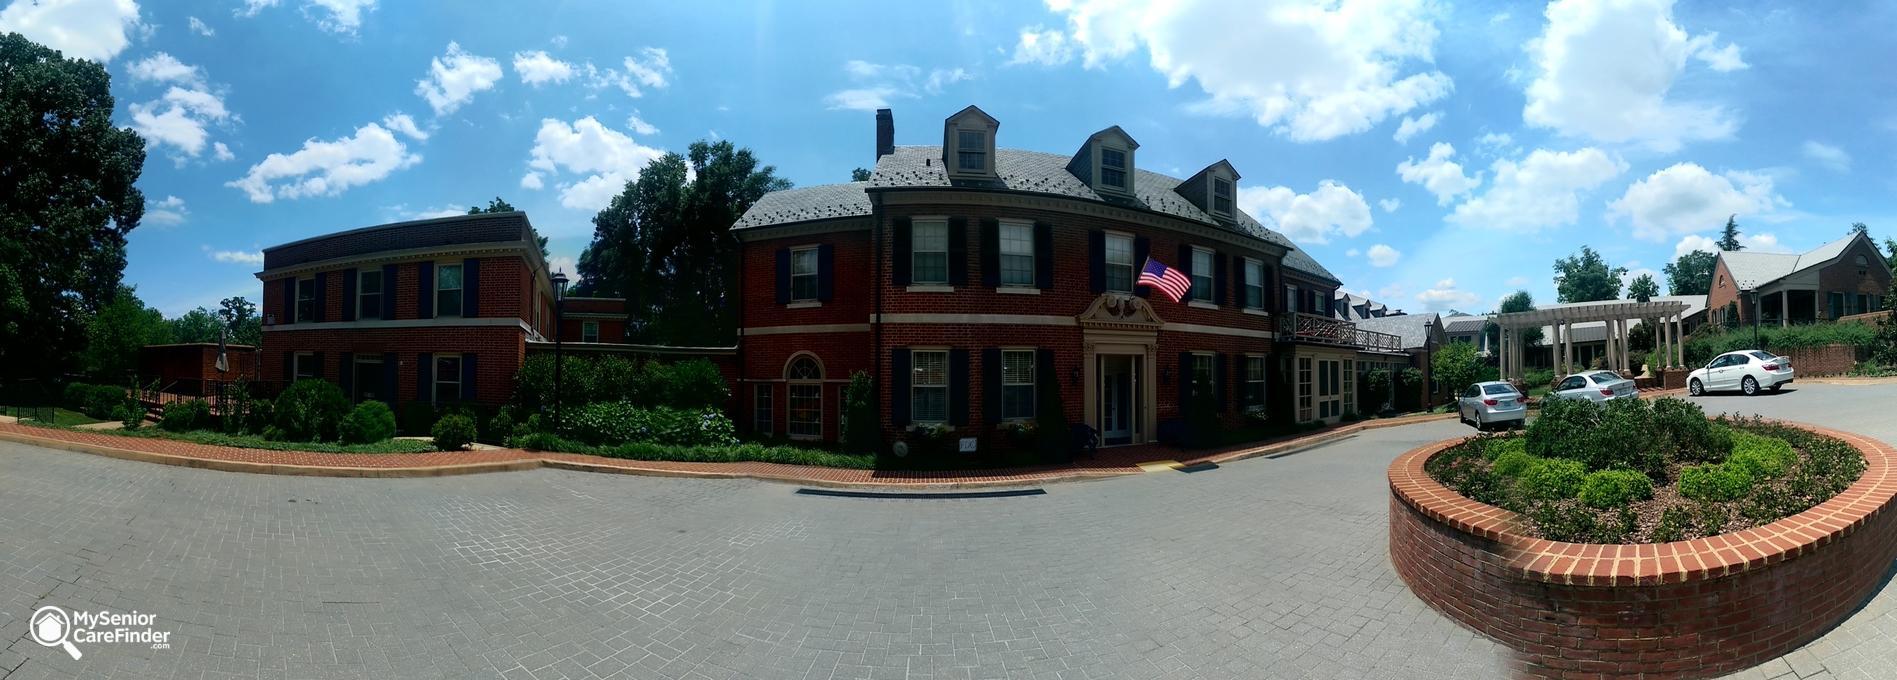 The Infirmary at Martha Jefferson House - Charlottesville, VA